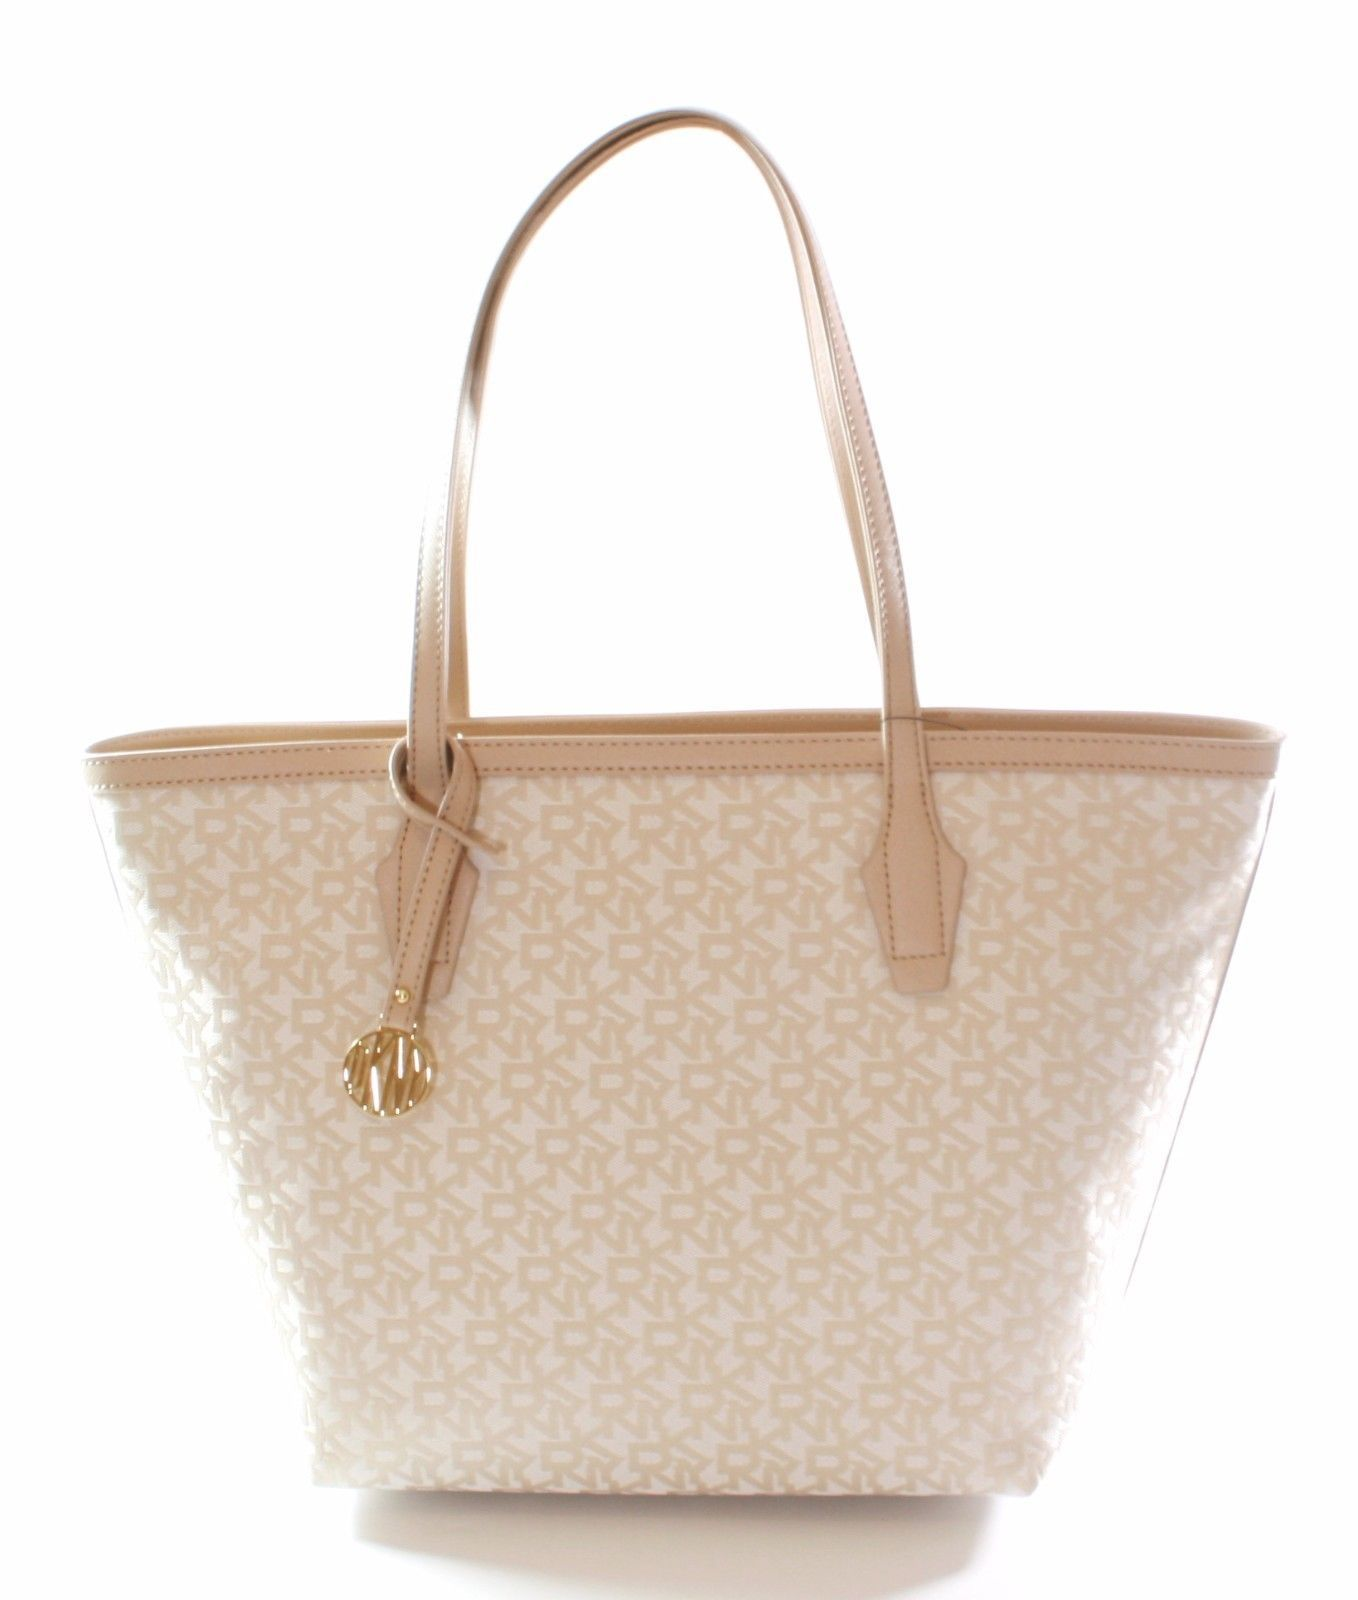 DKNY Donna Karan Heritage Canvas Beige Shopper Tote Bag Medium Handbag